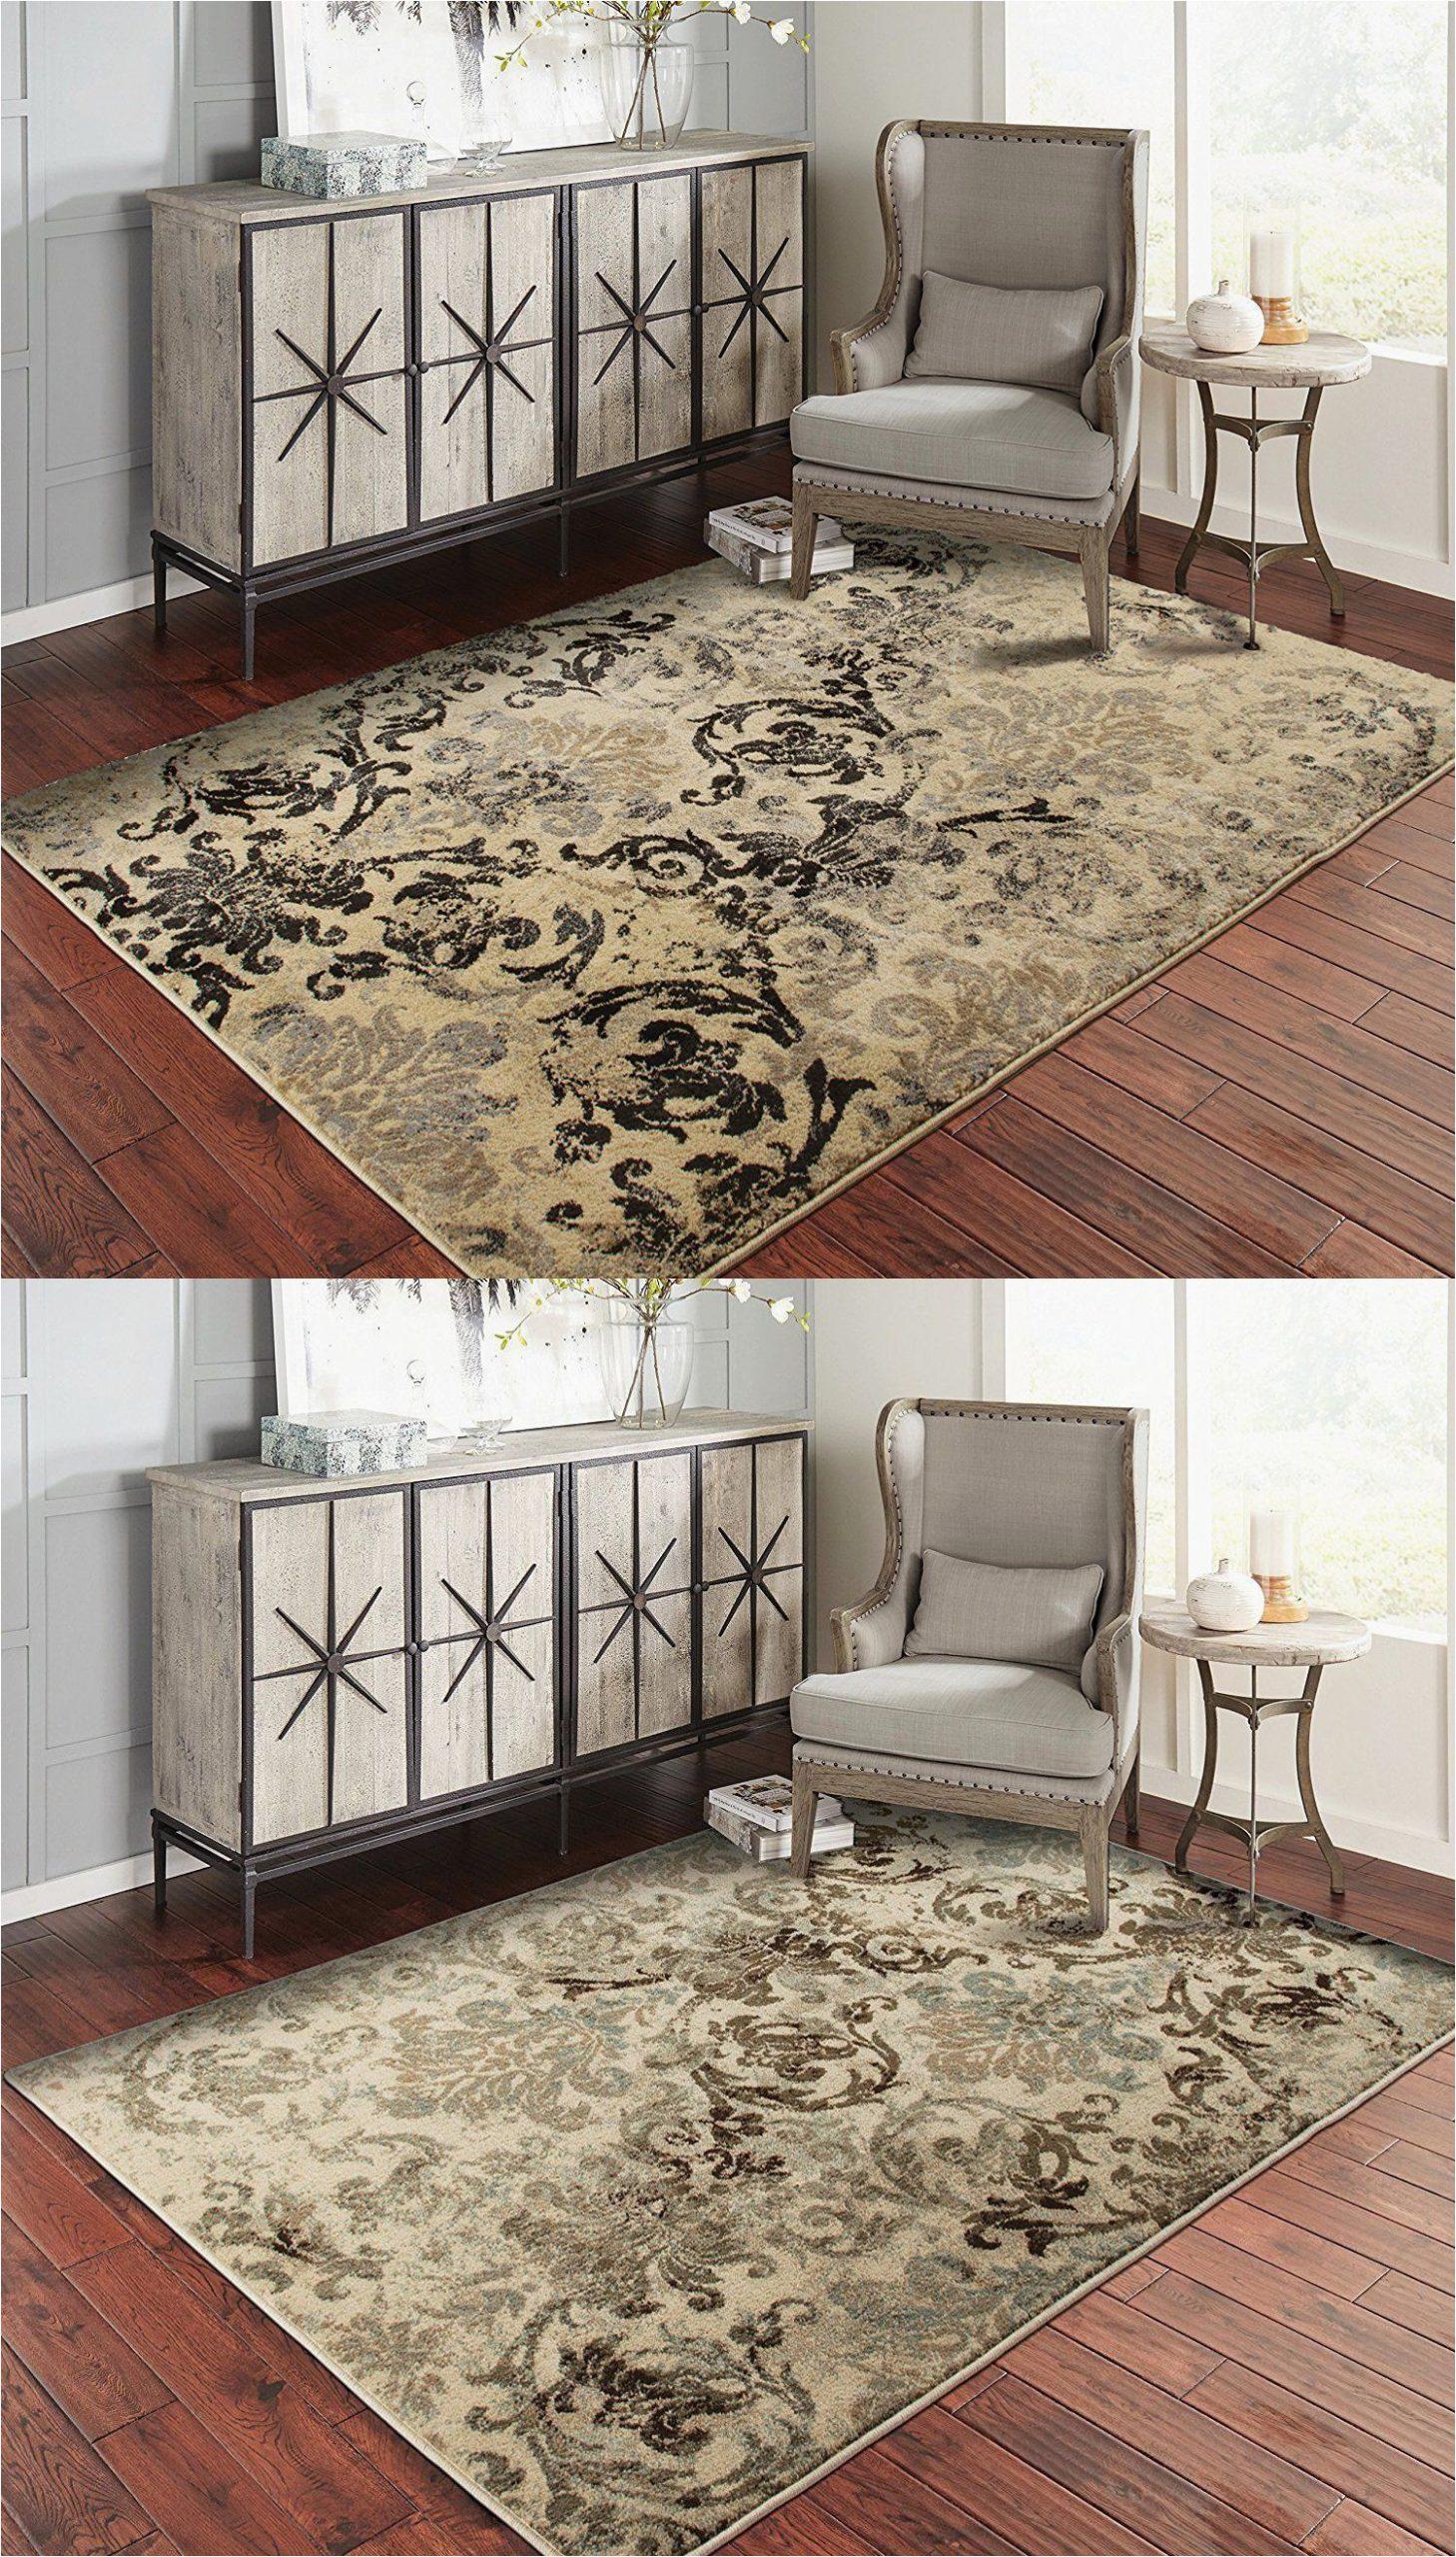 Room 8x10 Rug 5x8 Carpet